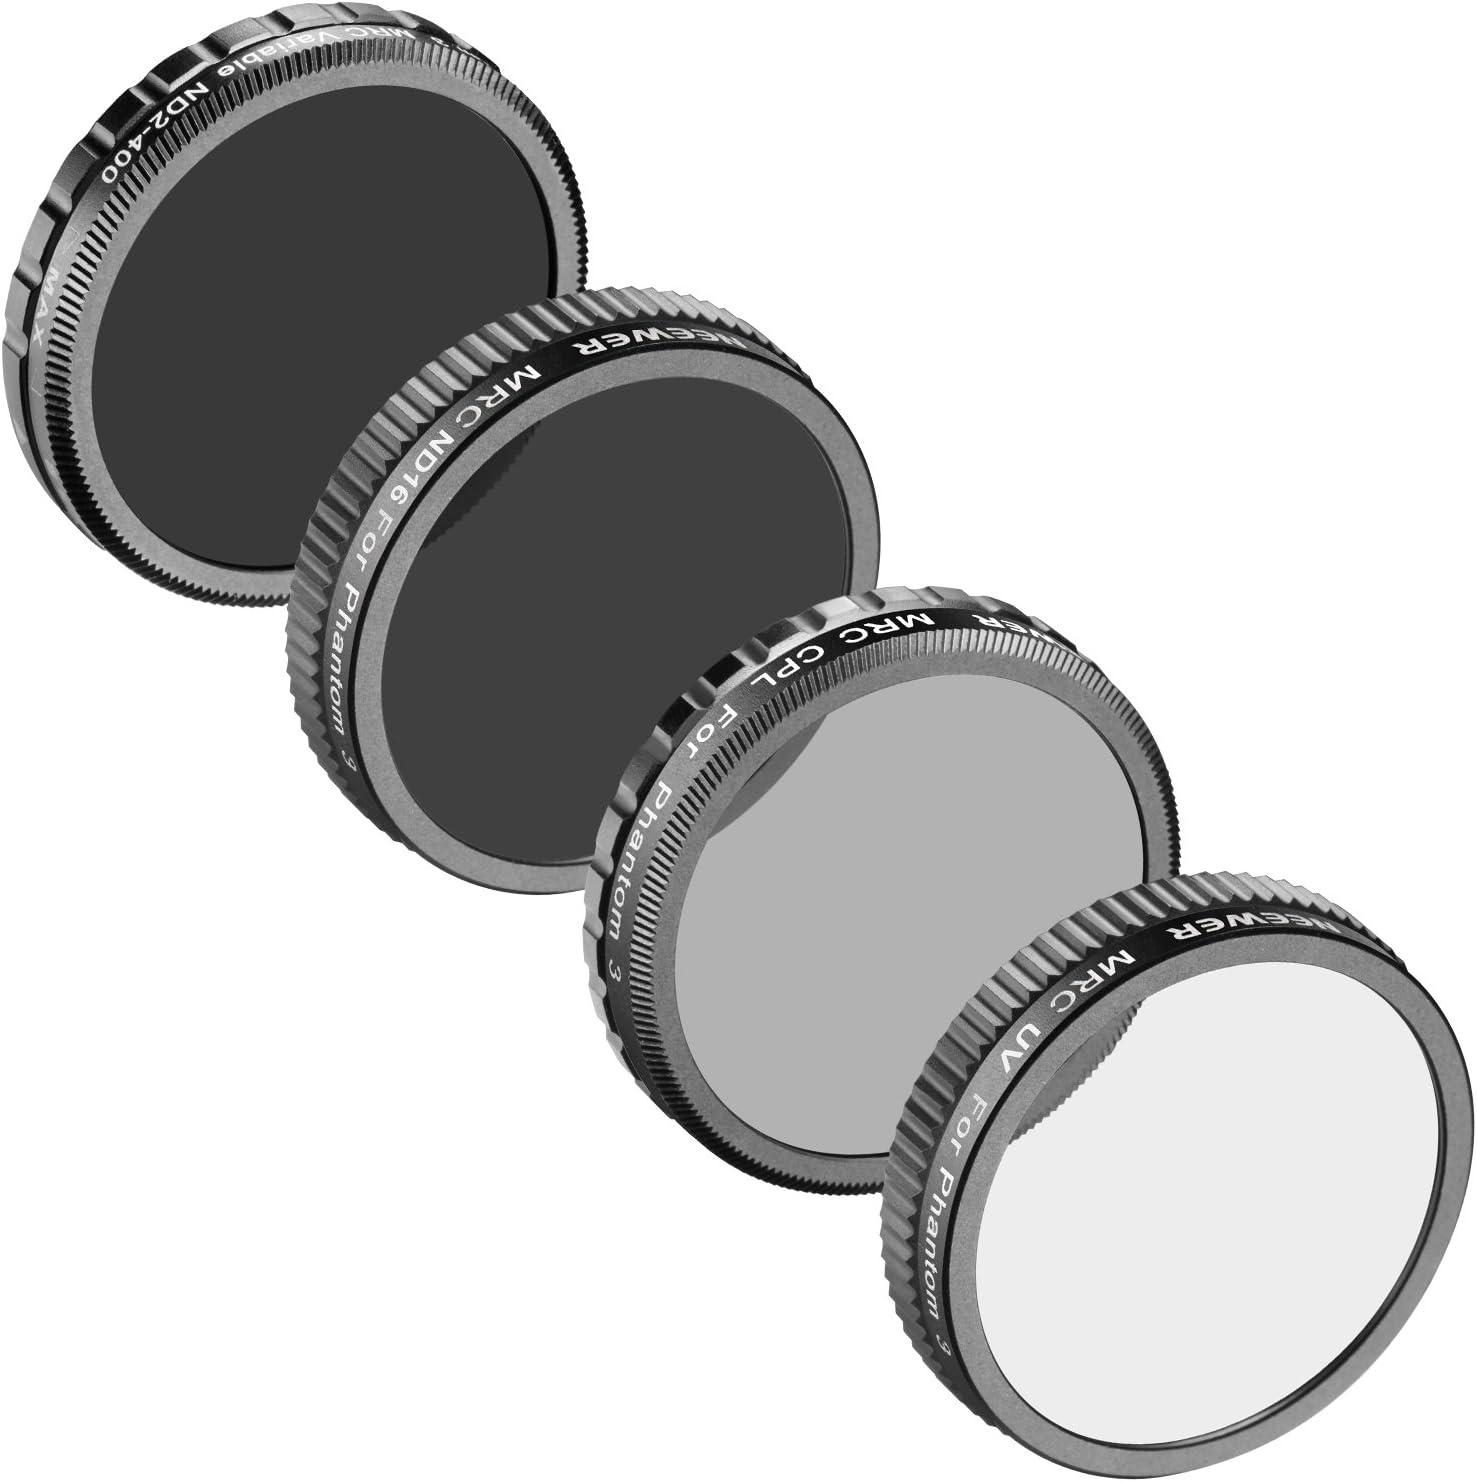 ND8 ND32 ND8//PL PolarPro DJI Spark Filter 6 Stück Kamerafilter CP ND16